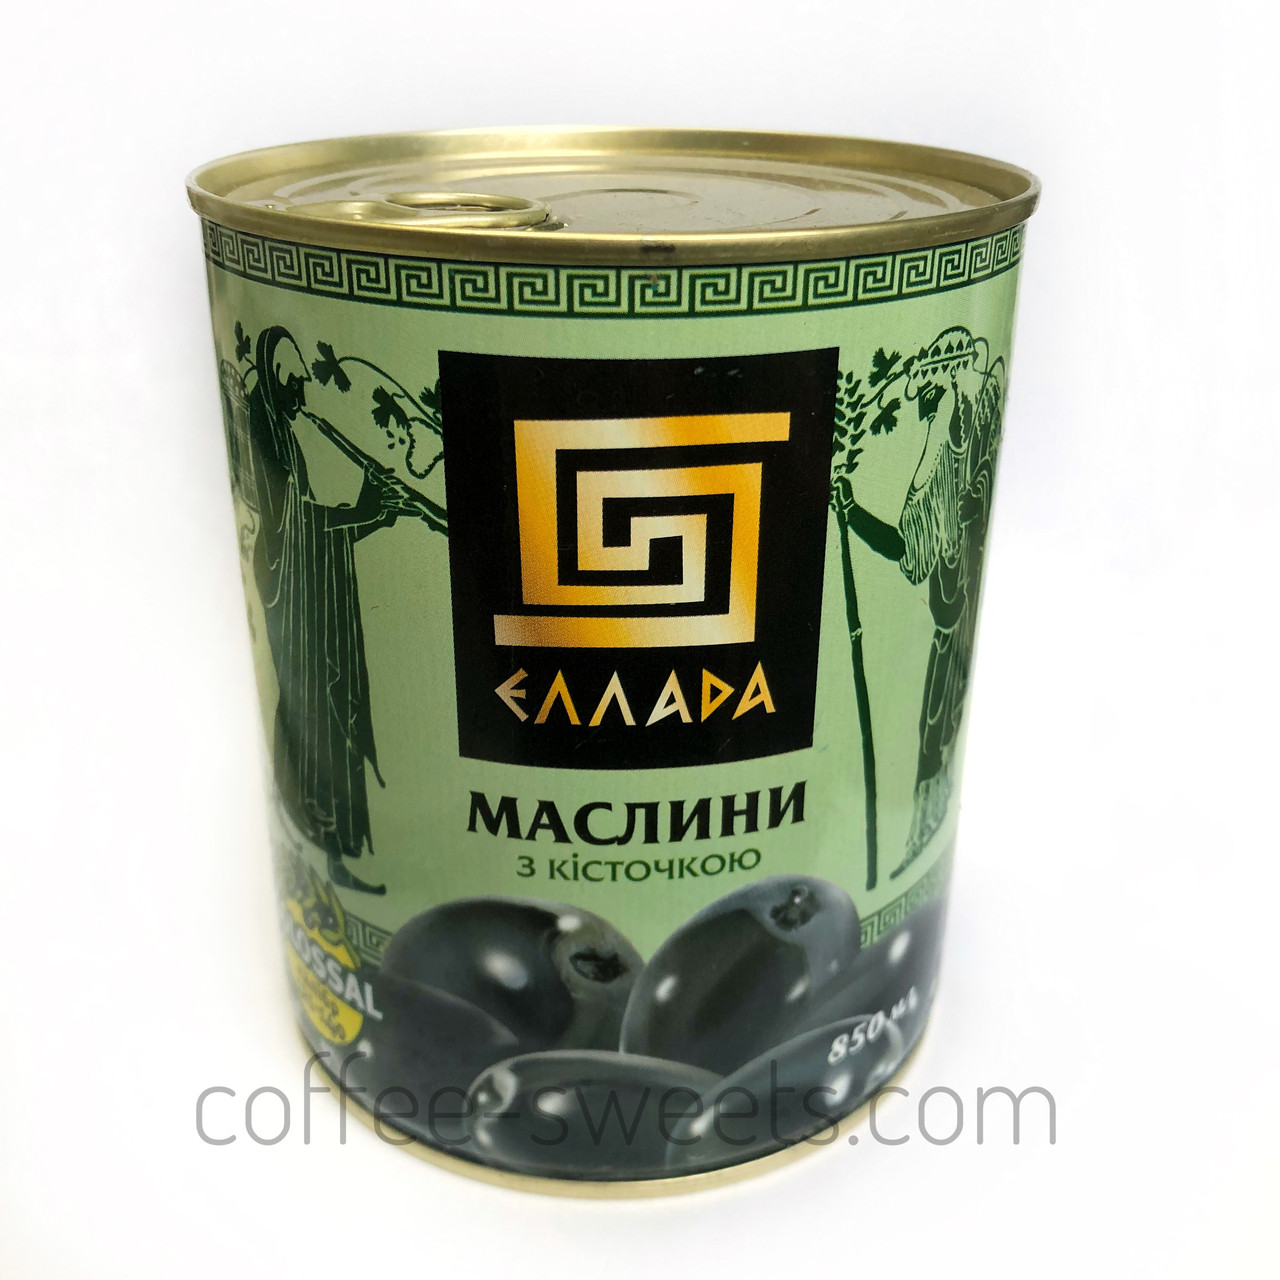 "Маслины с косточкой ""Эллада"" (colossal калибр 121-140) 850гр"